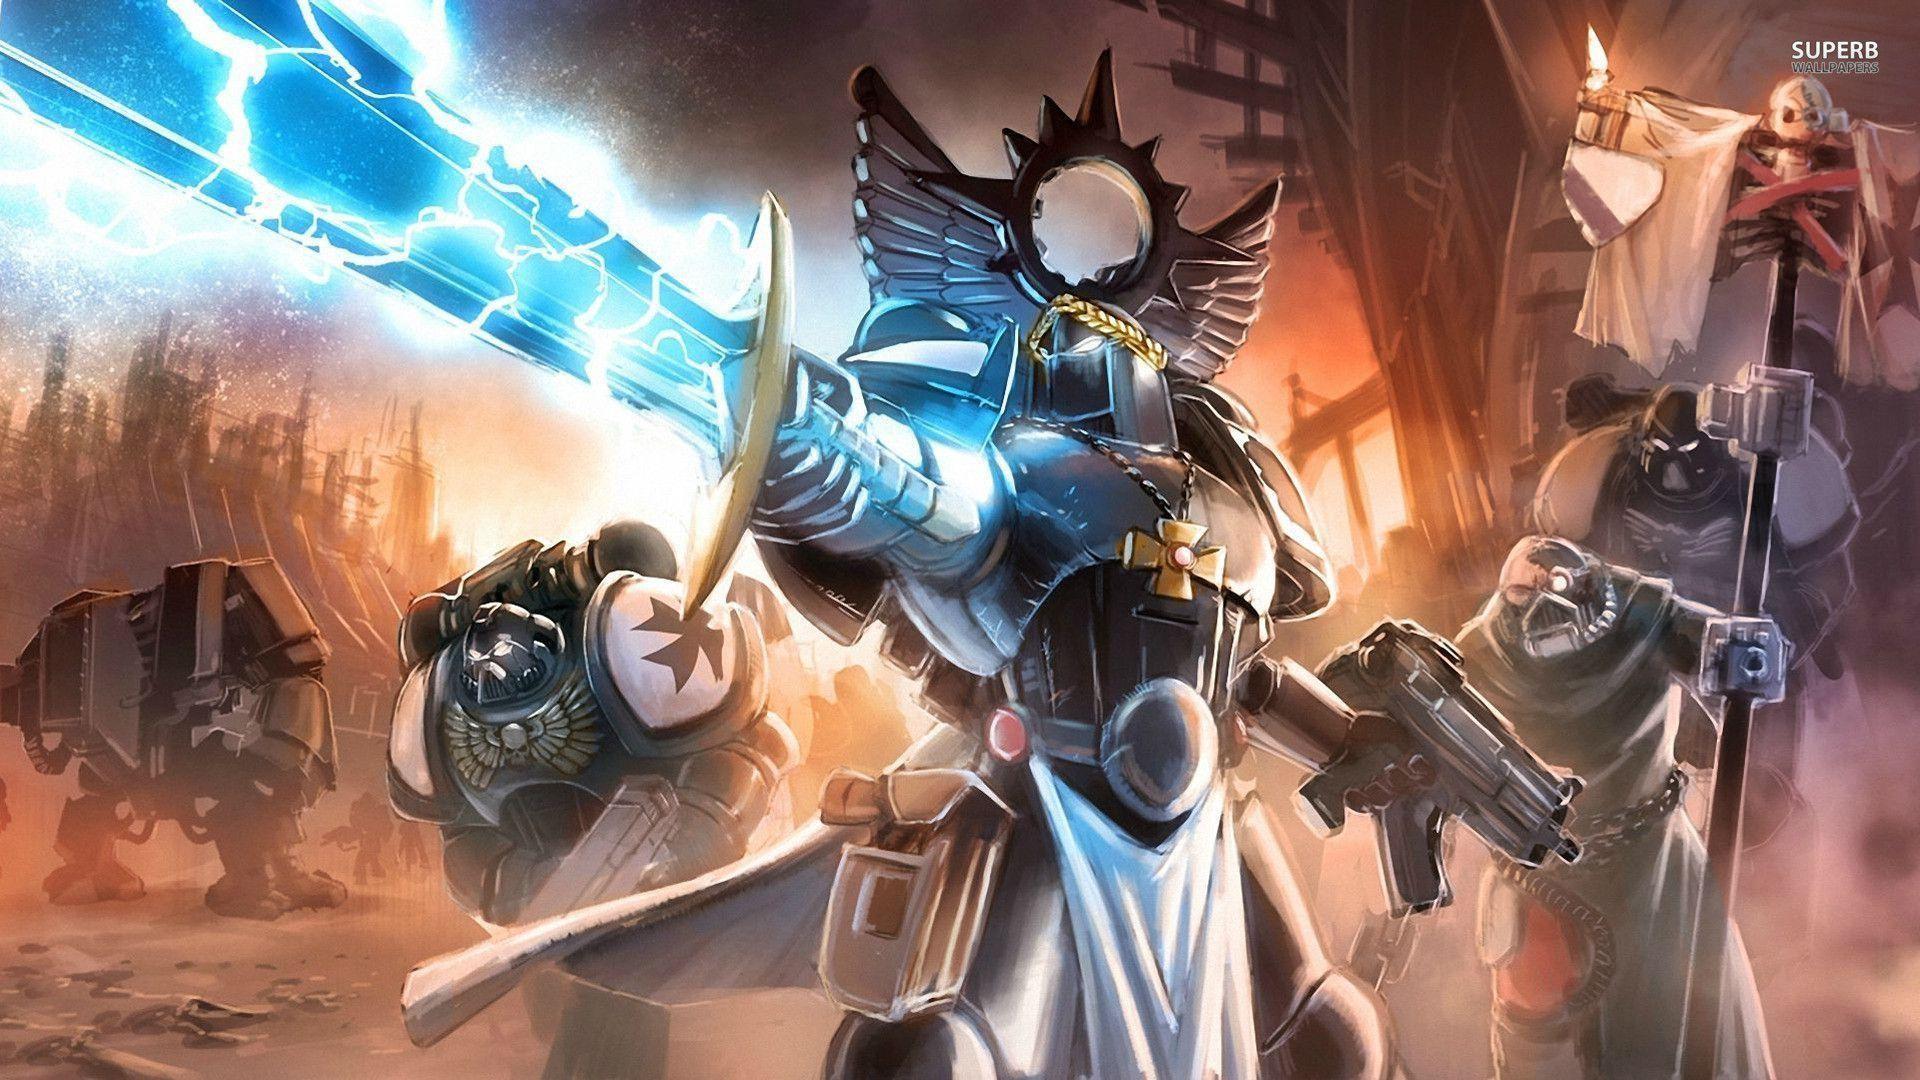 Warhammer 40,000: Space Marine wallpaper – Game wallpapers – #